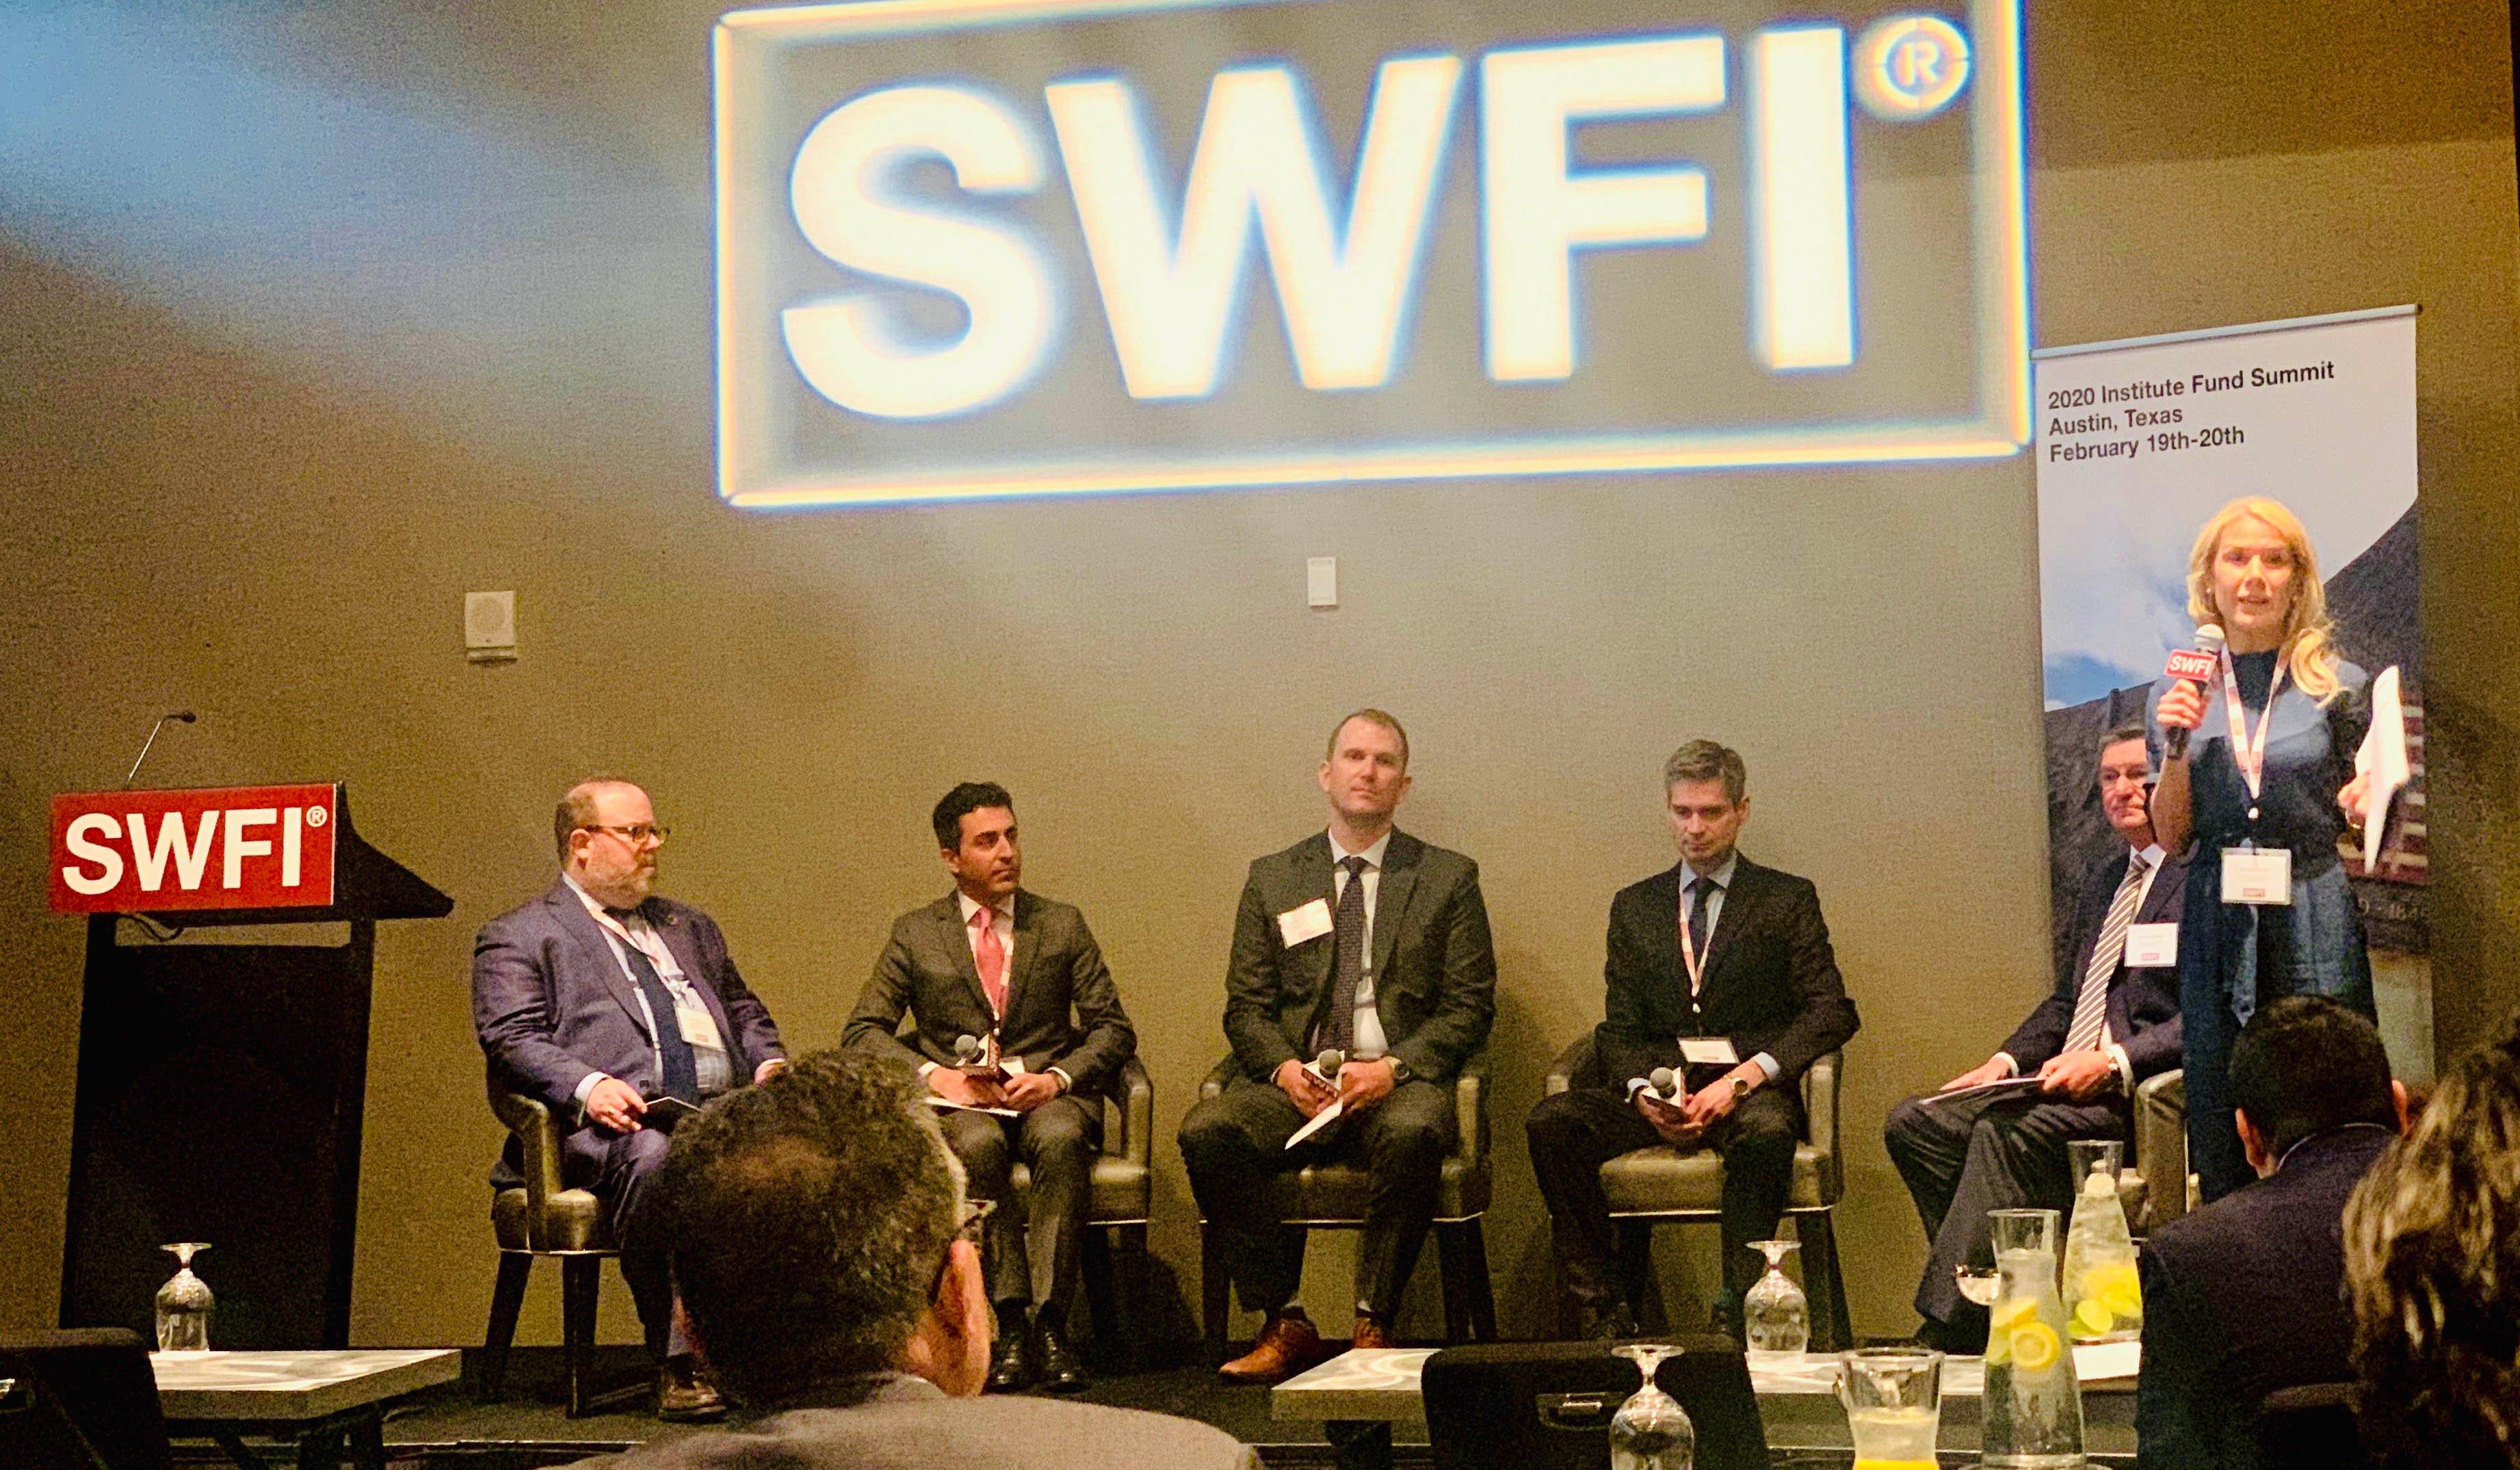 SWFI 2020 - Austin cropped